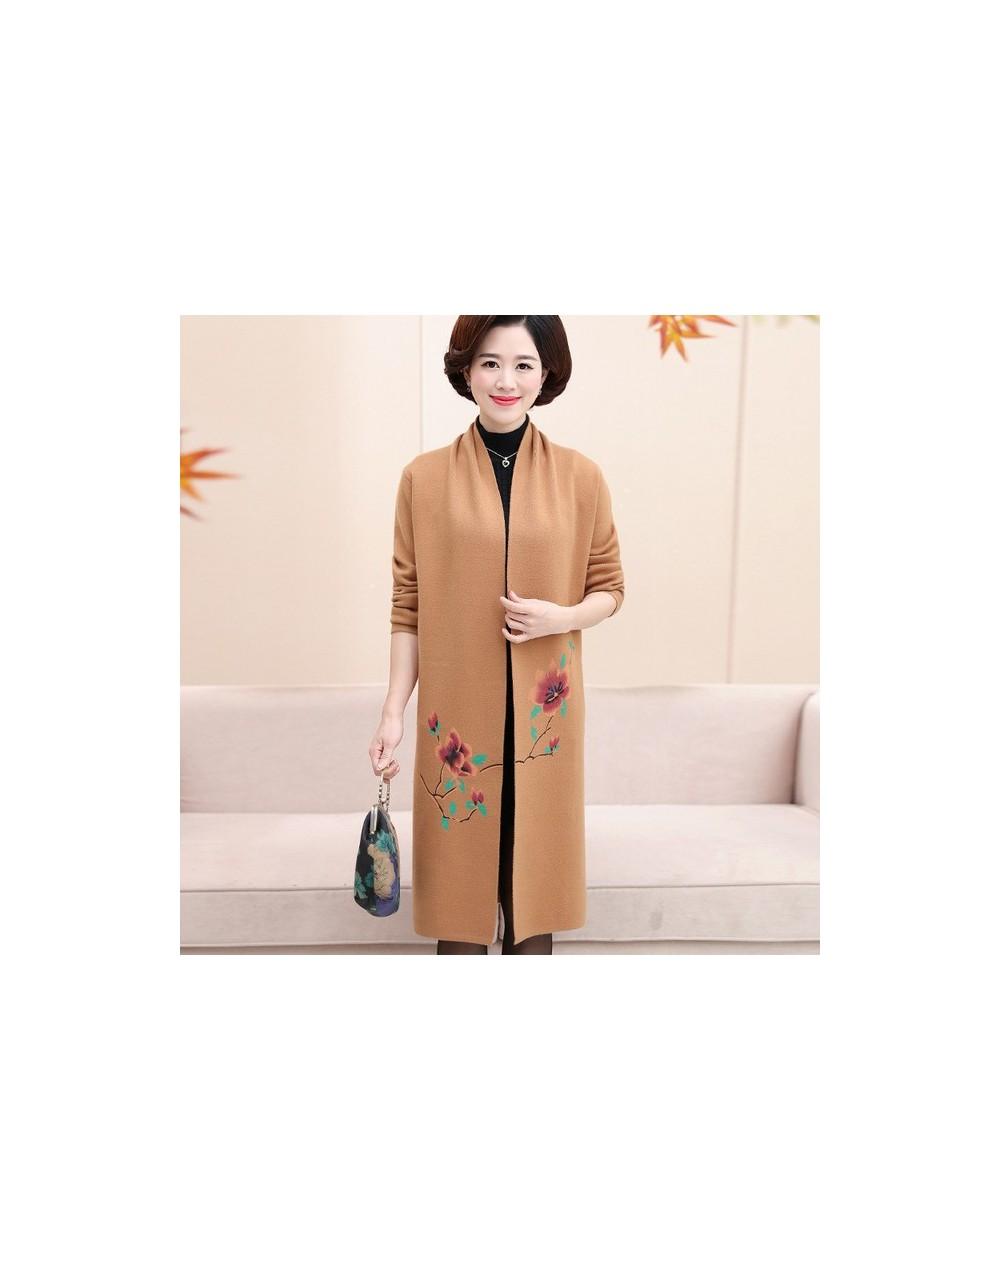 2019 Autumn Winter New Brand Middle-Aged Women Sweater Fashion Long Cardigan Print High Quality Wool Blend Cardigan Female R...